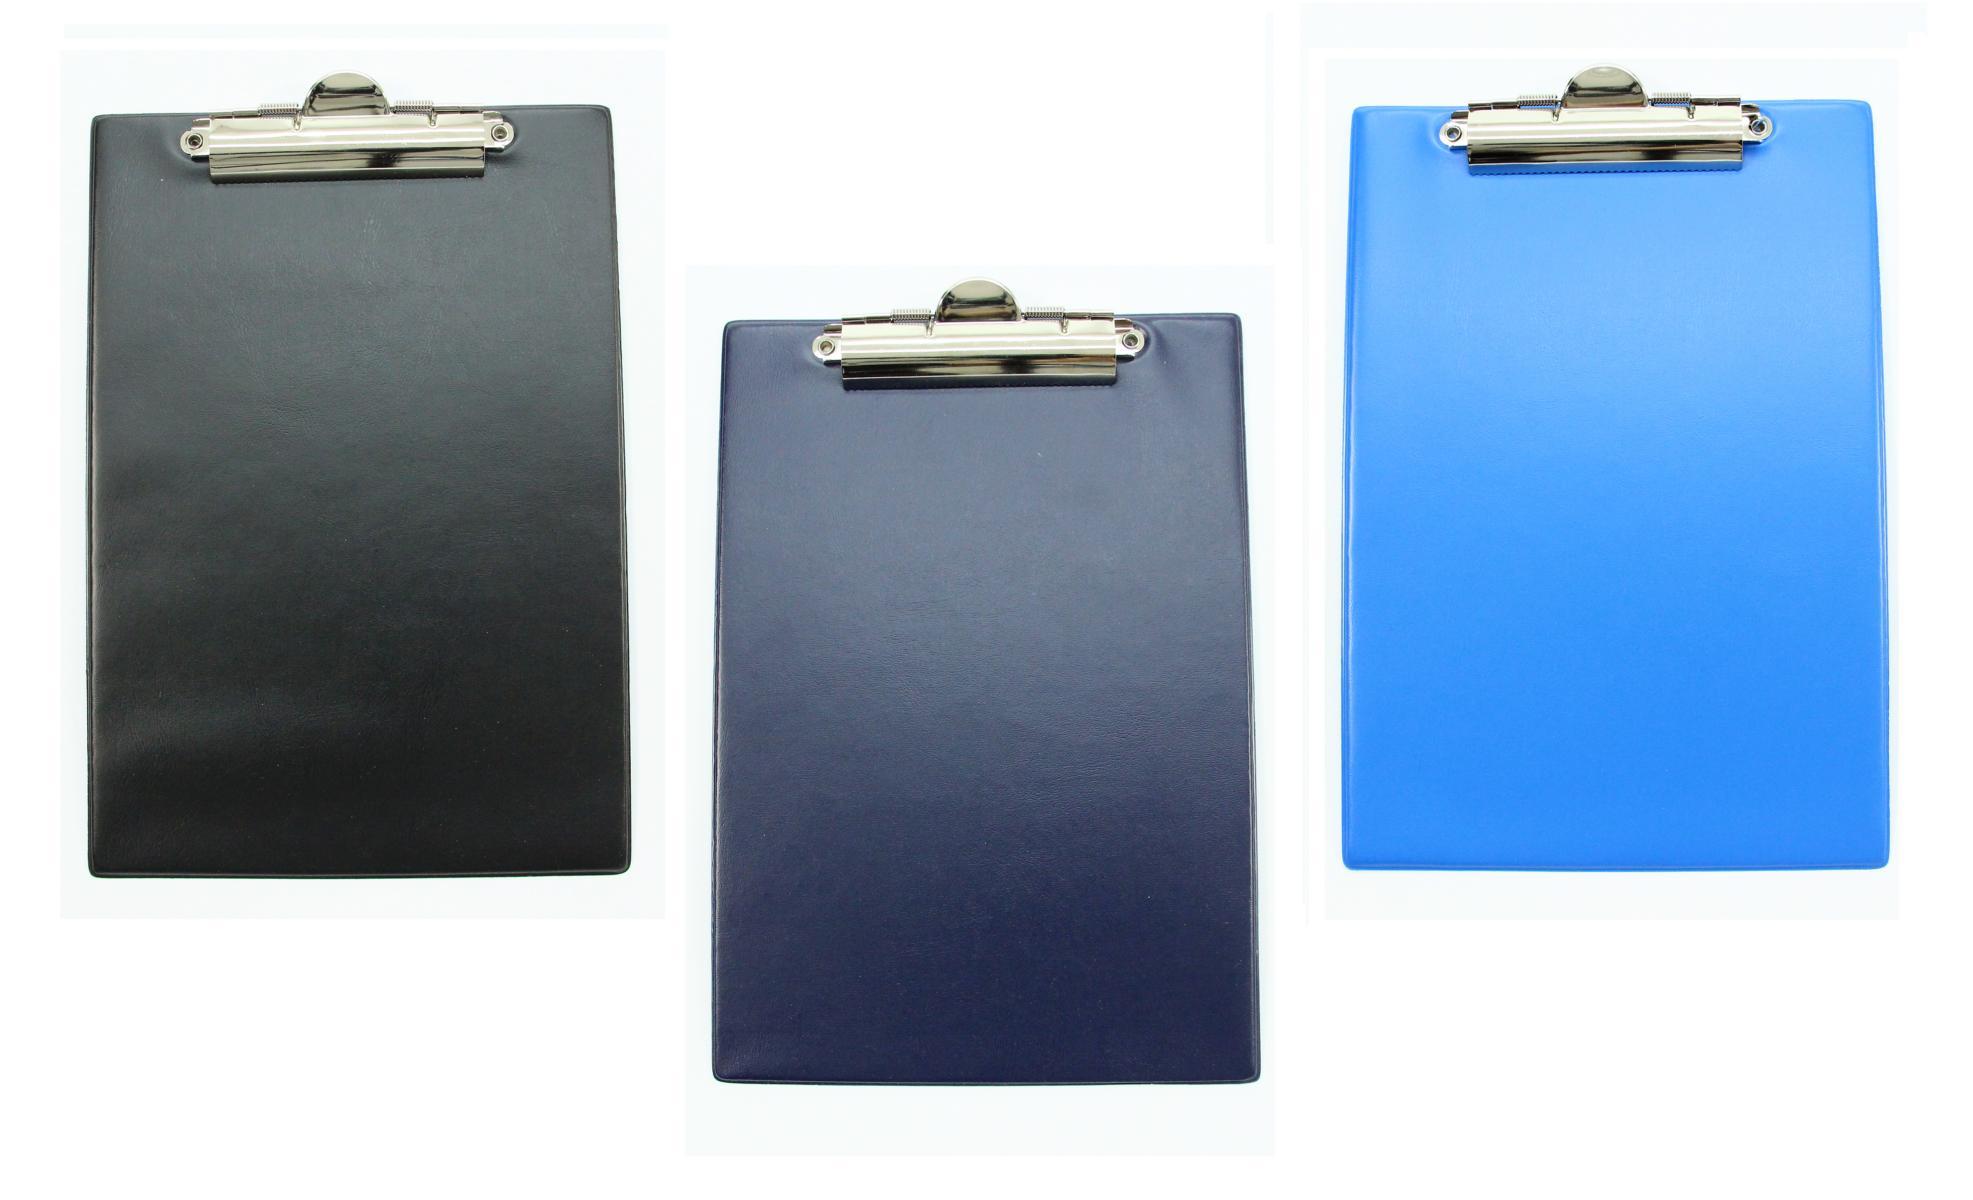 aus PVC Farbe dunkelblau Klemmbrett DIN A4